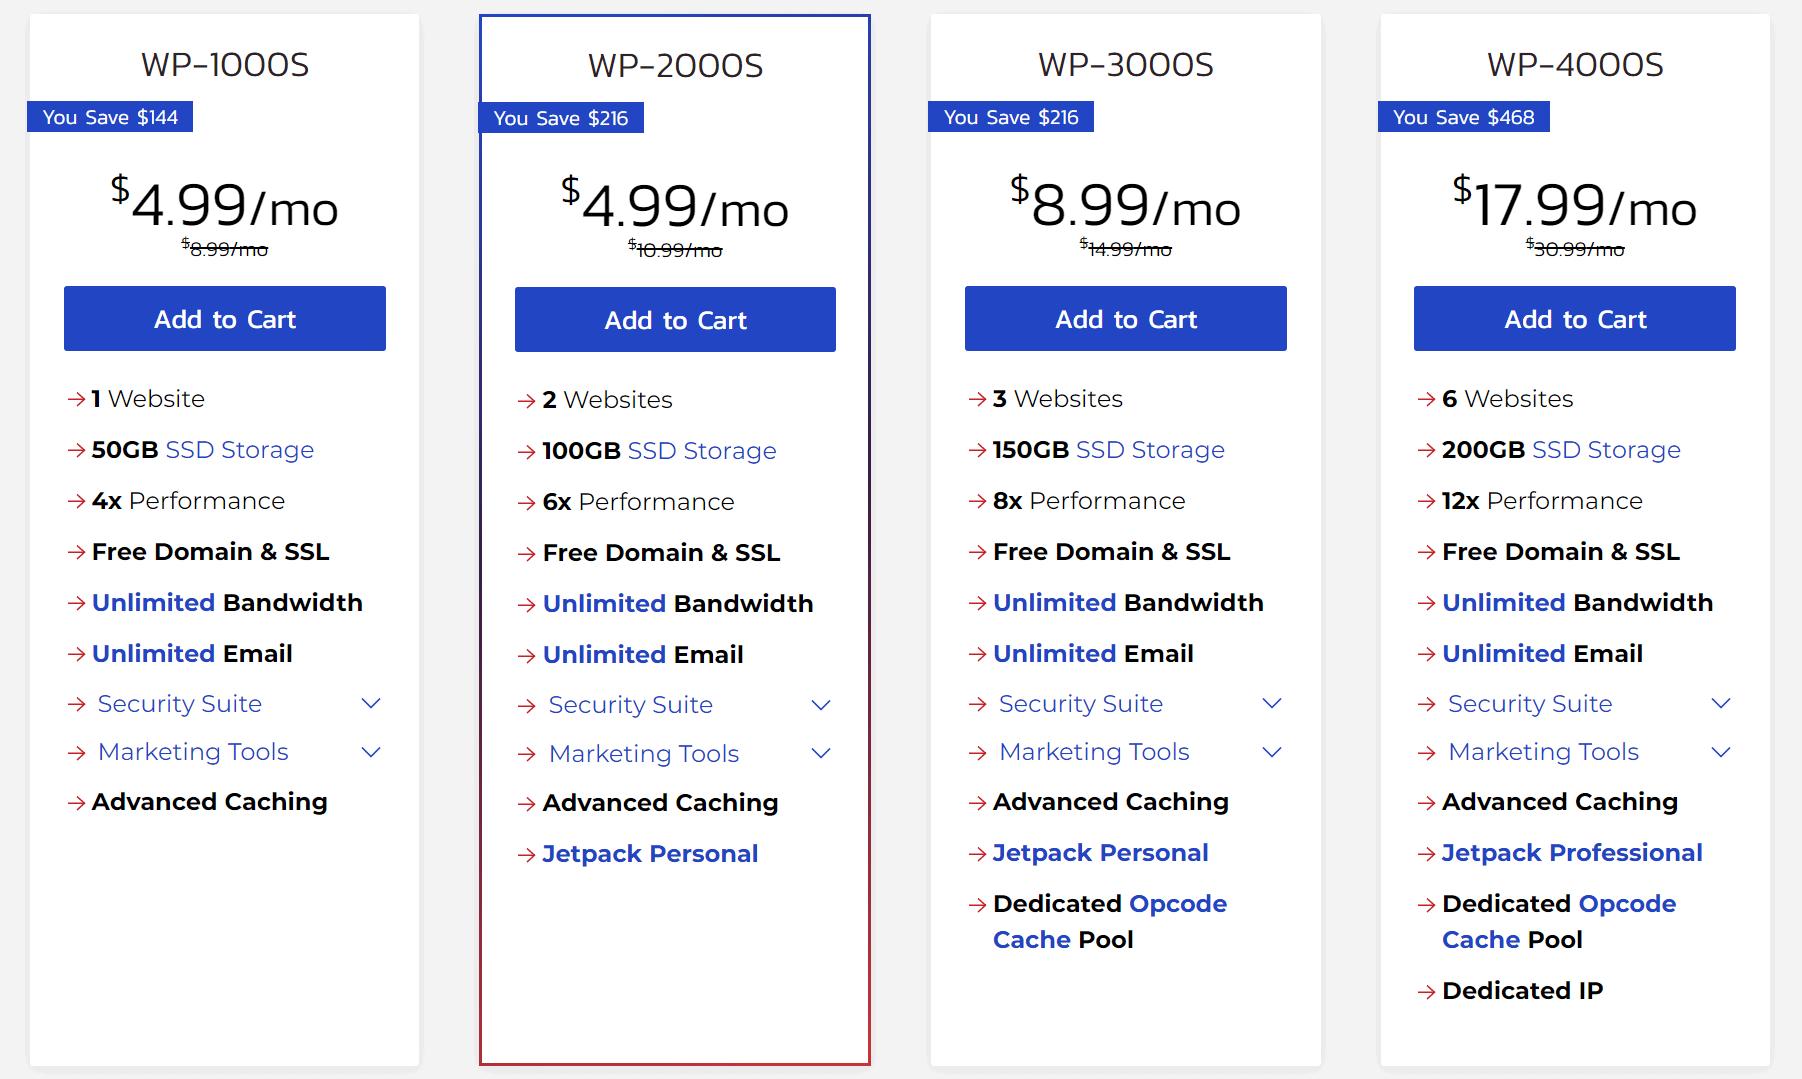 WordPress-Hosting-Best-WP-Plans-Prices-InMotion-Hosting